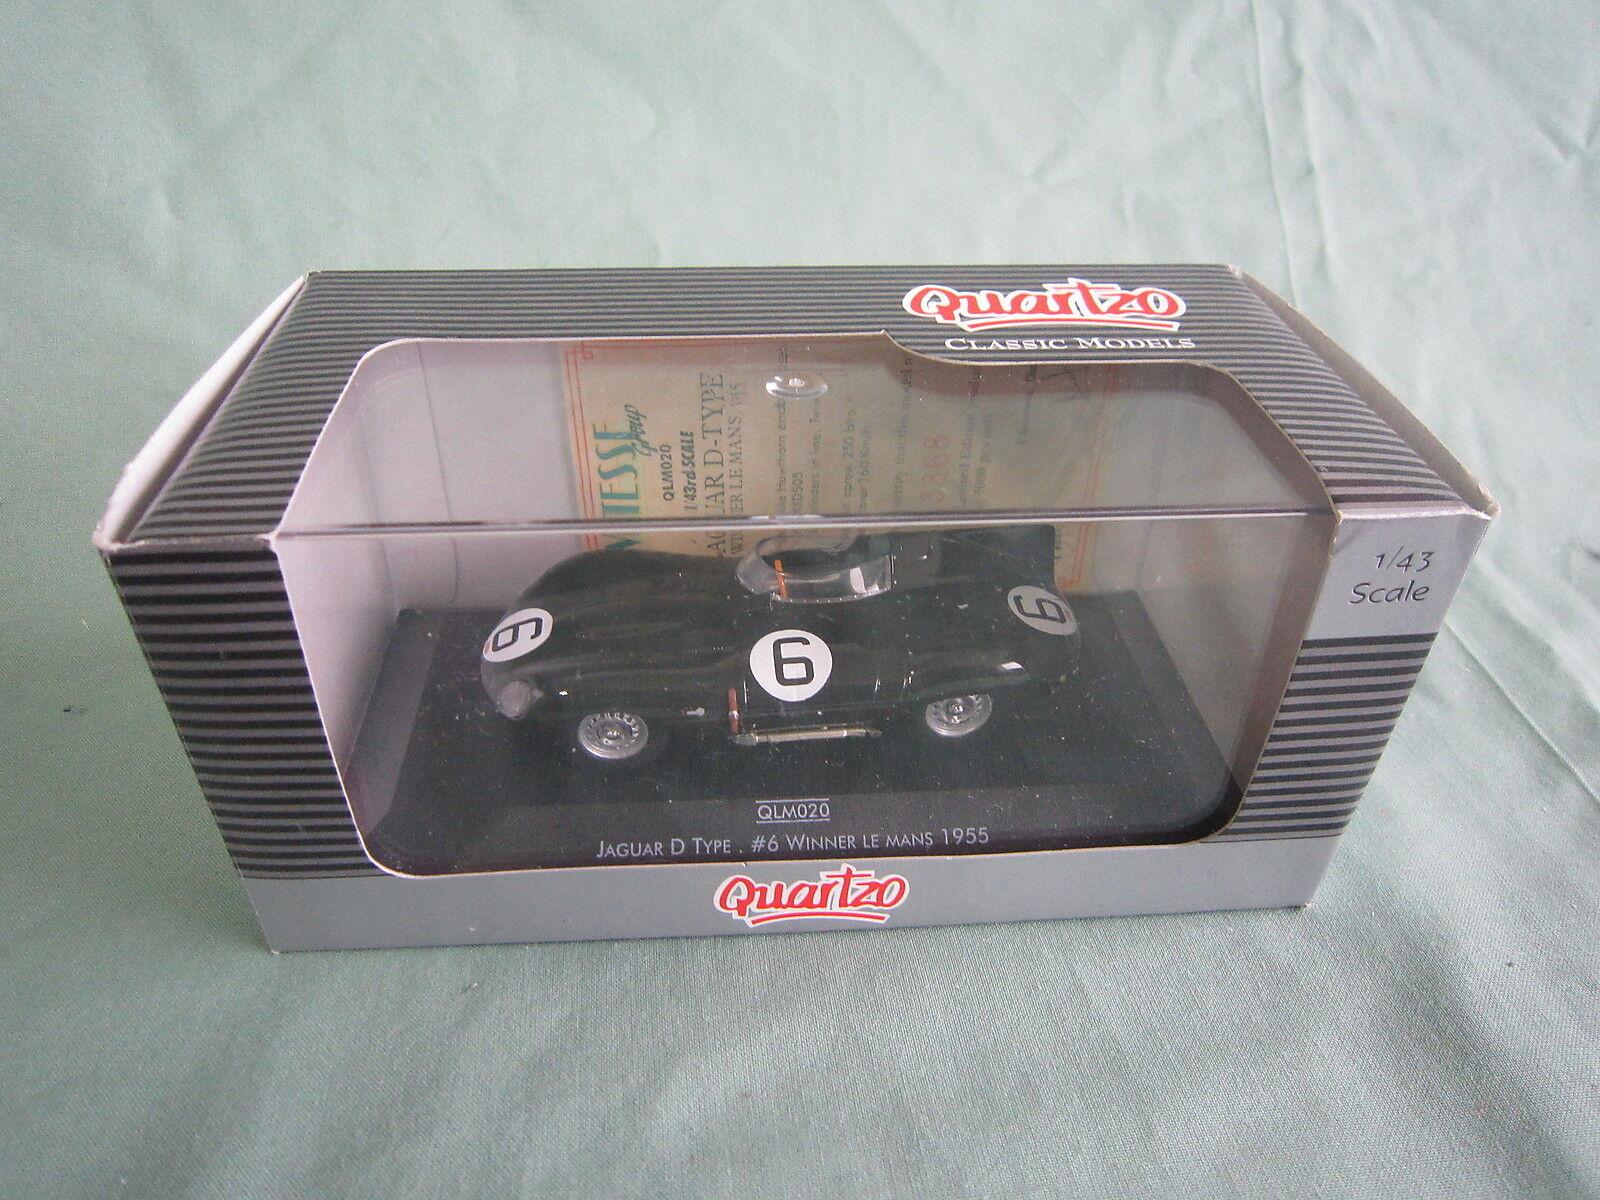 Dv4762 quartzo vitesse jaguar d - gewinner 1955 le - mans - sammlung   6 qlm020 1   43